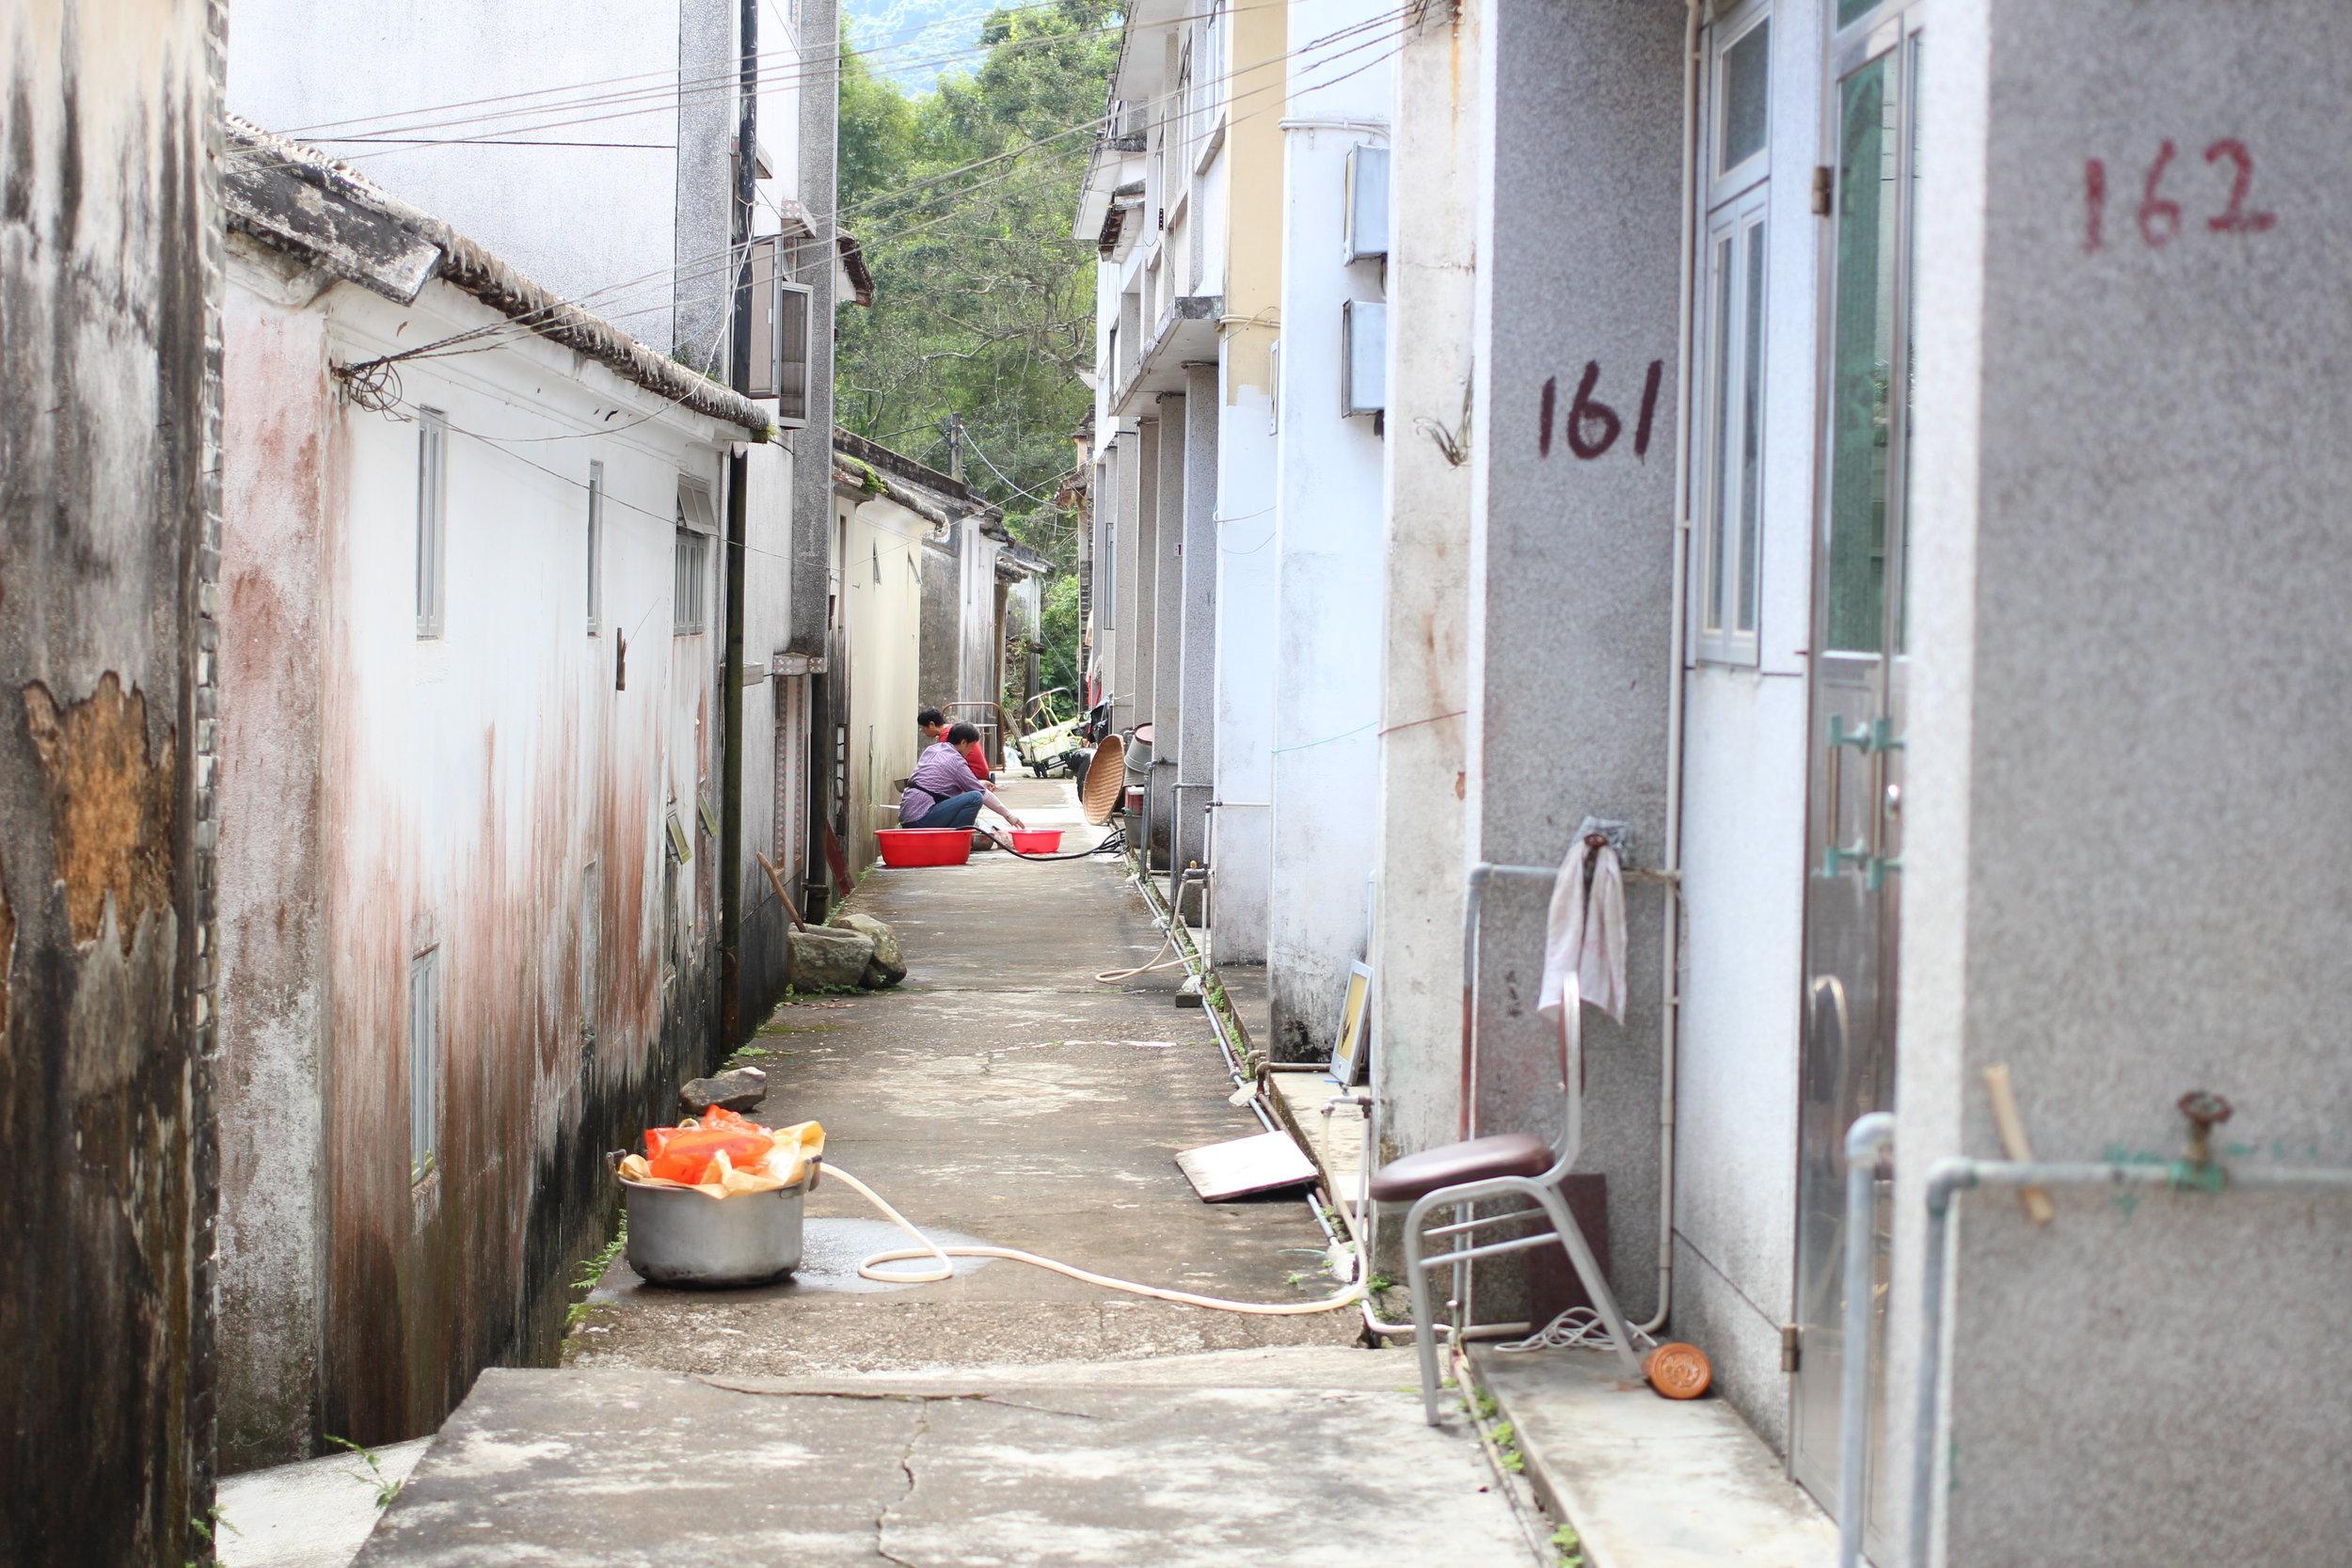 laichiwo_island_hongkong.jpg